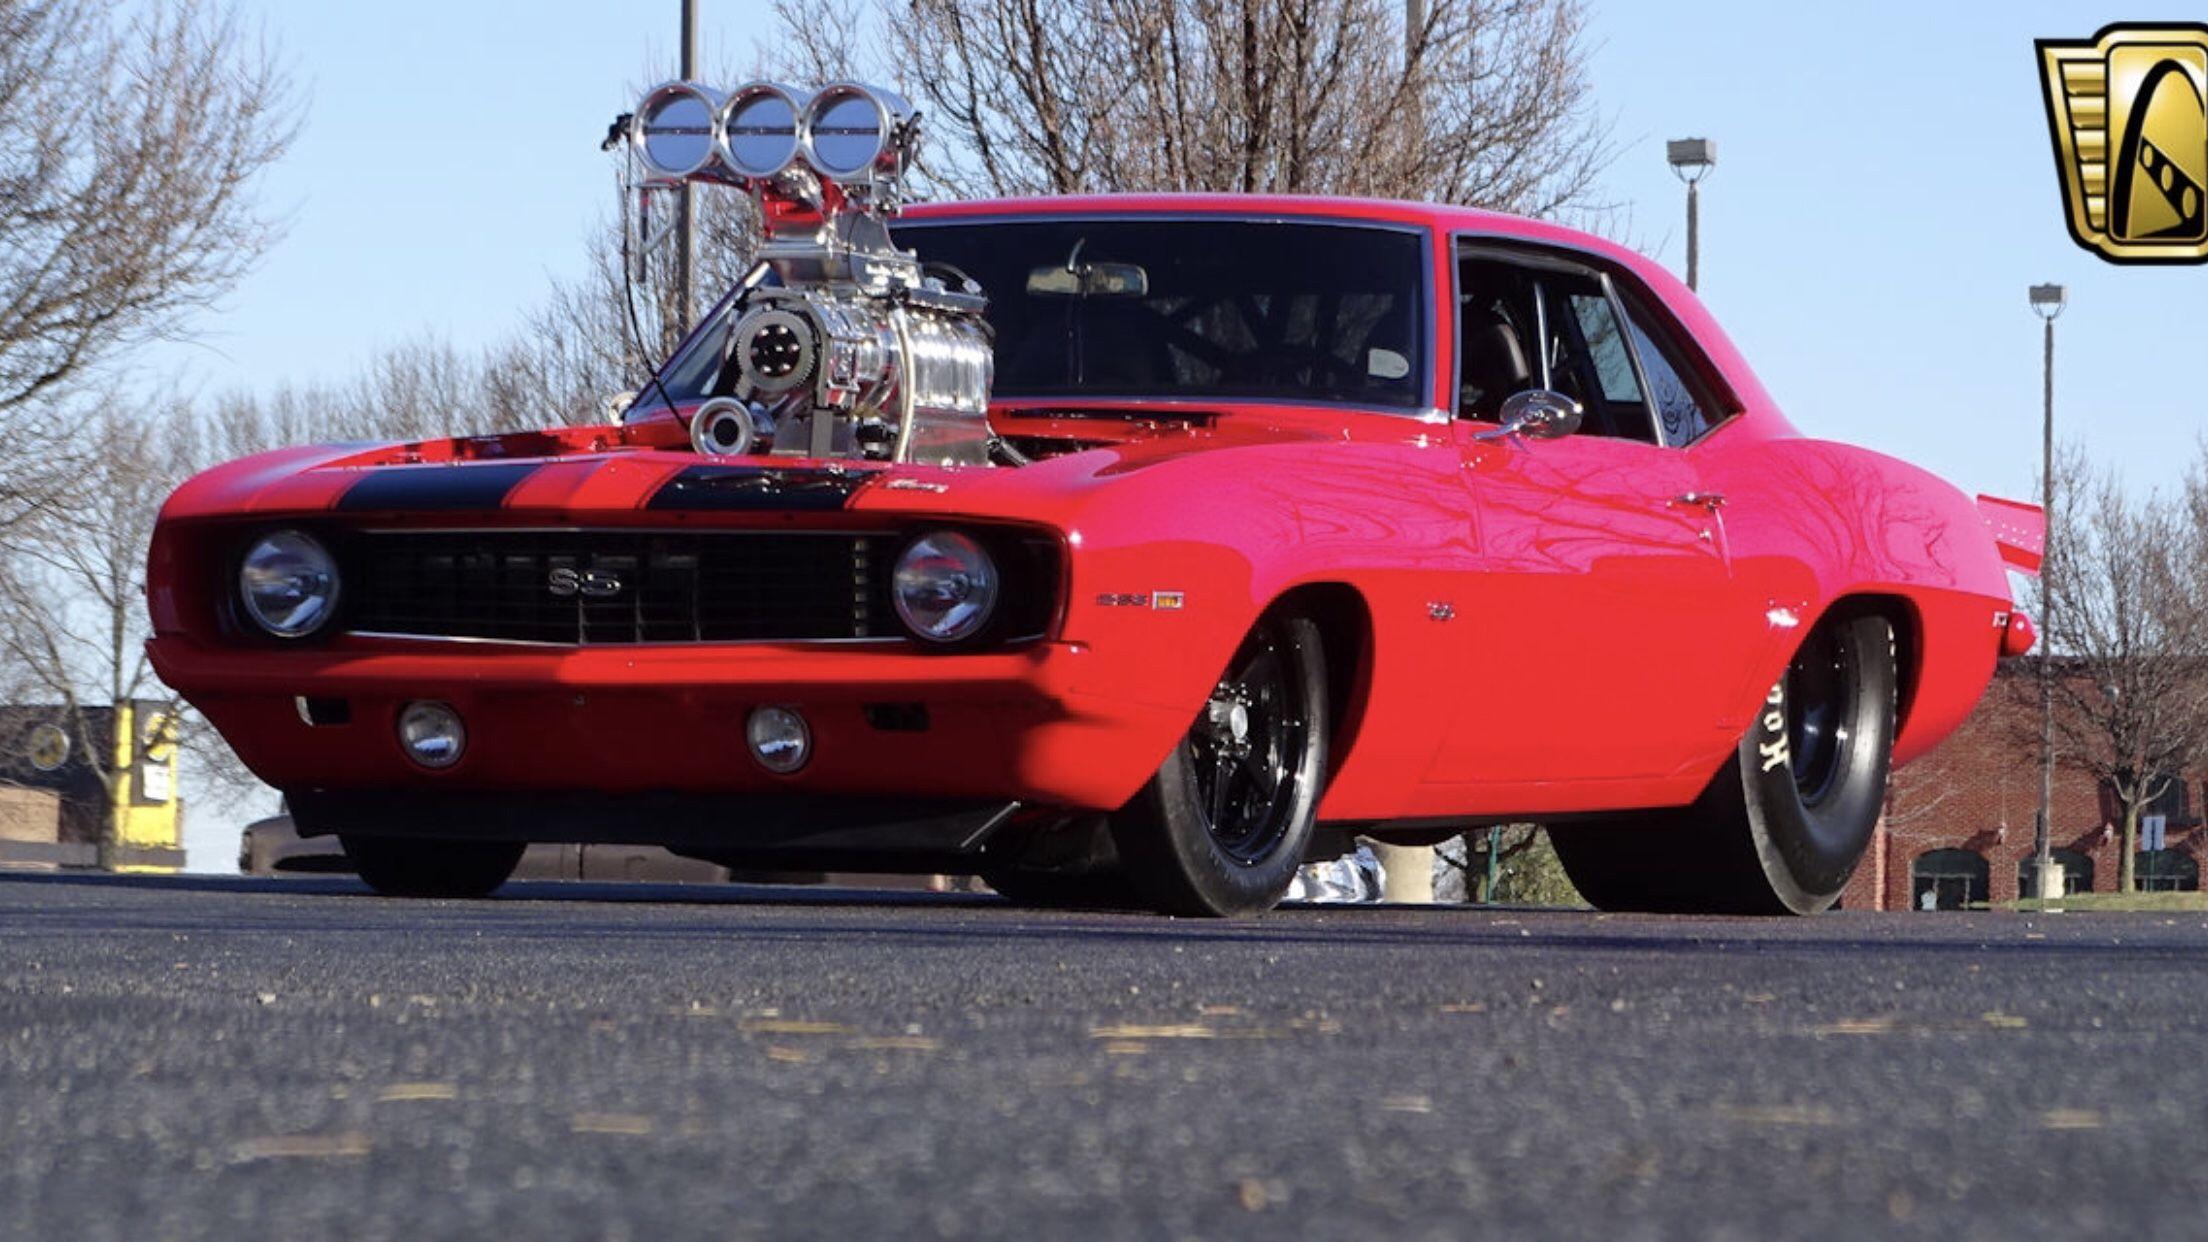 Gateway Classic Cars Blown 1969 Prostreet Camaro Camaro Hot Rods Cars Muscle Drag Racing Cars